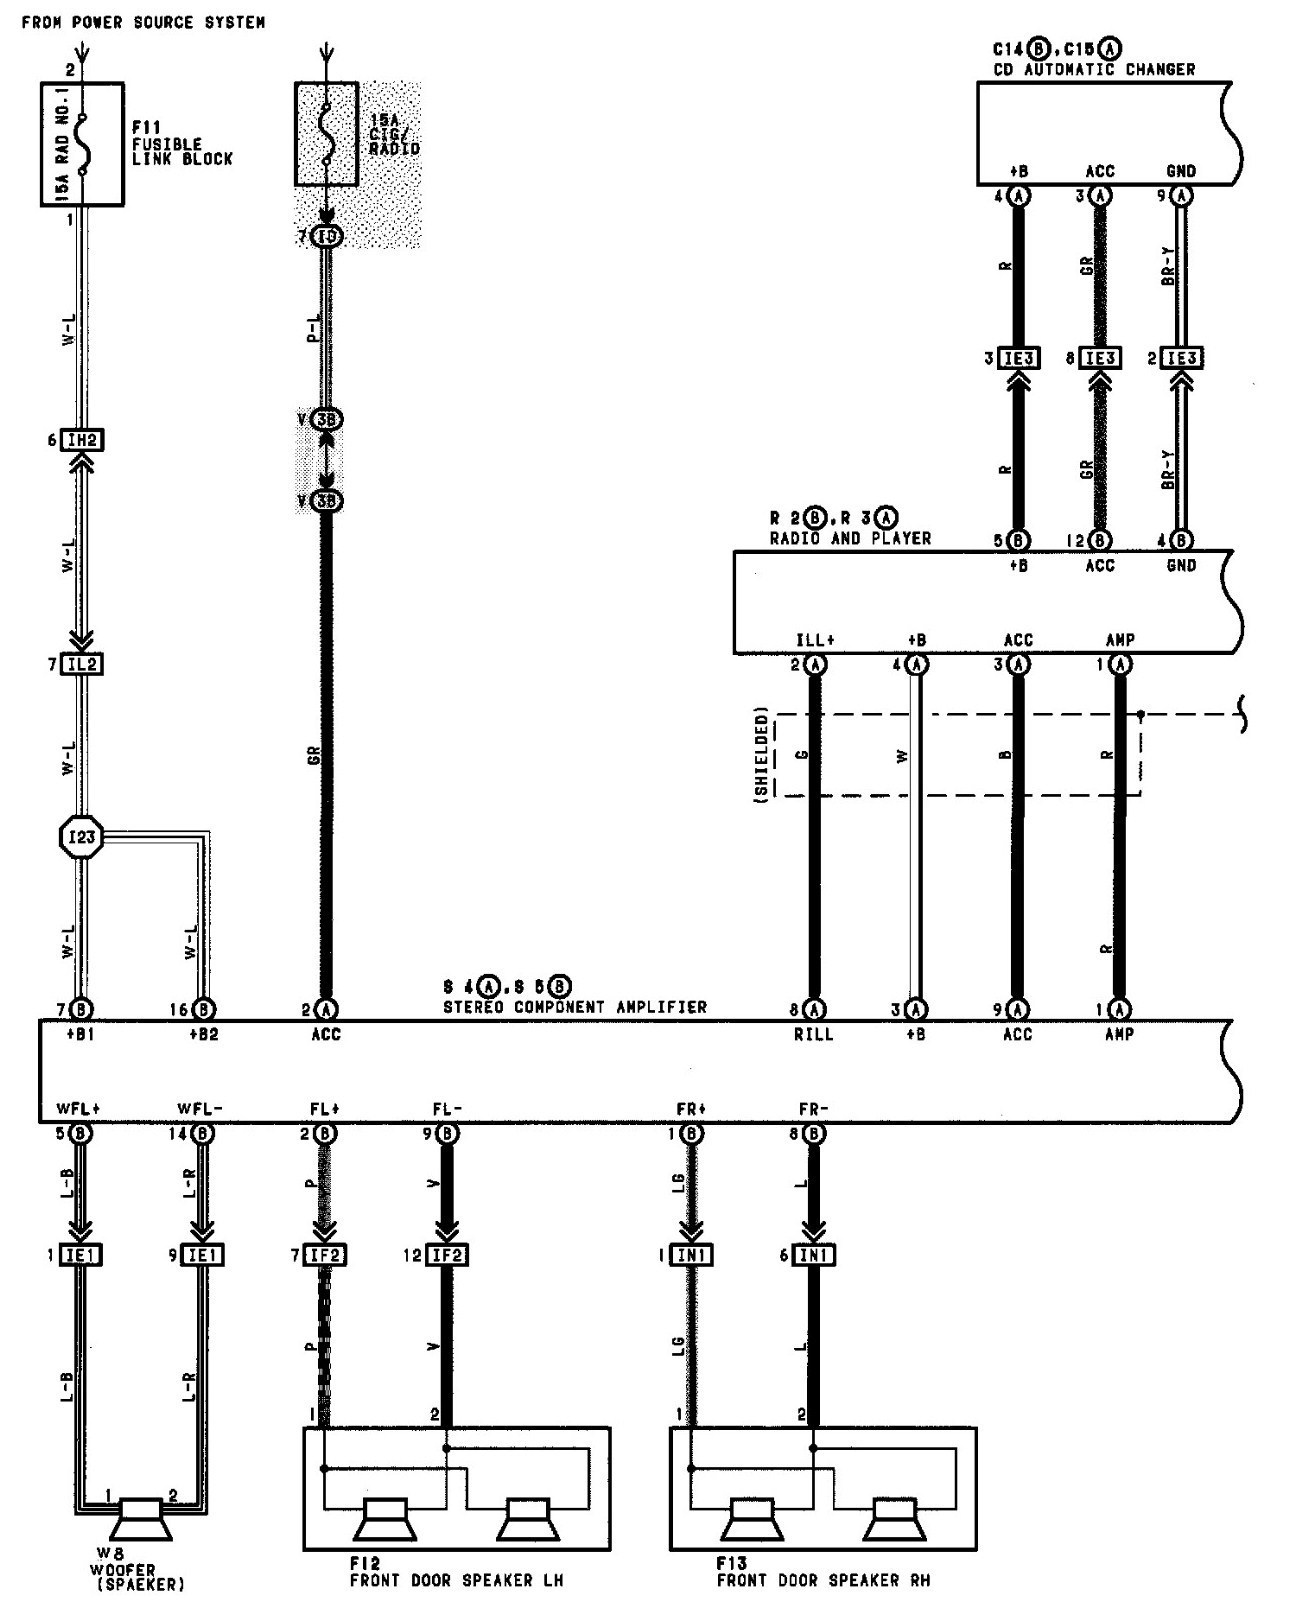 toyota highlander wiring schematics fo 0999  toyota pickup wiring diagrams besides 2013 toyota rav4  toyota pickup wiring diagrams besides